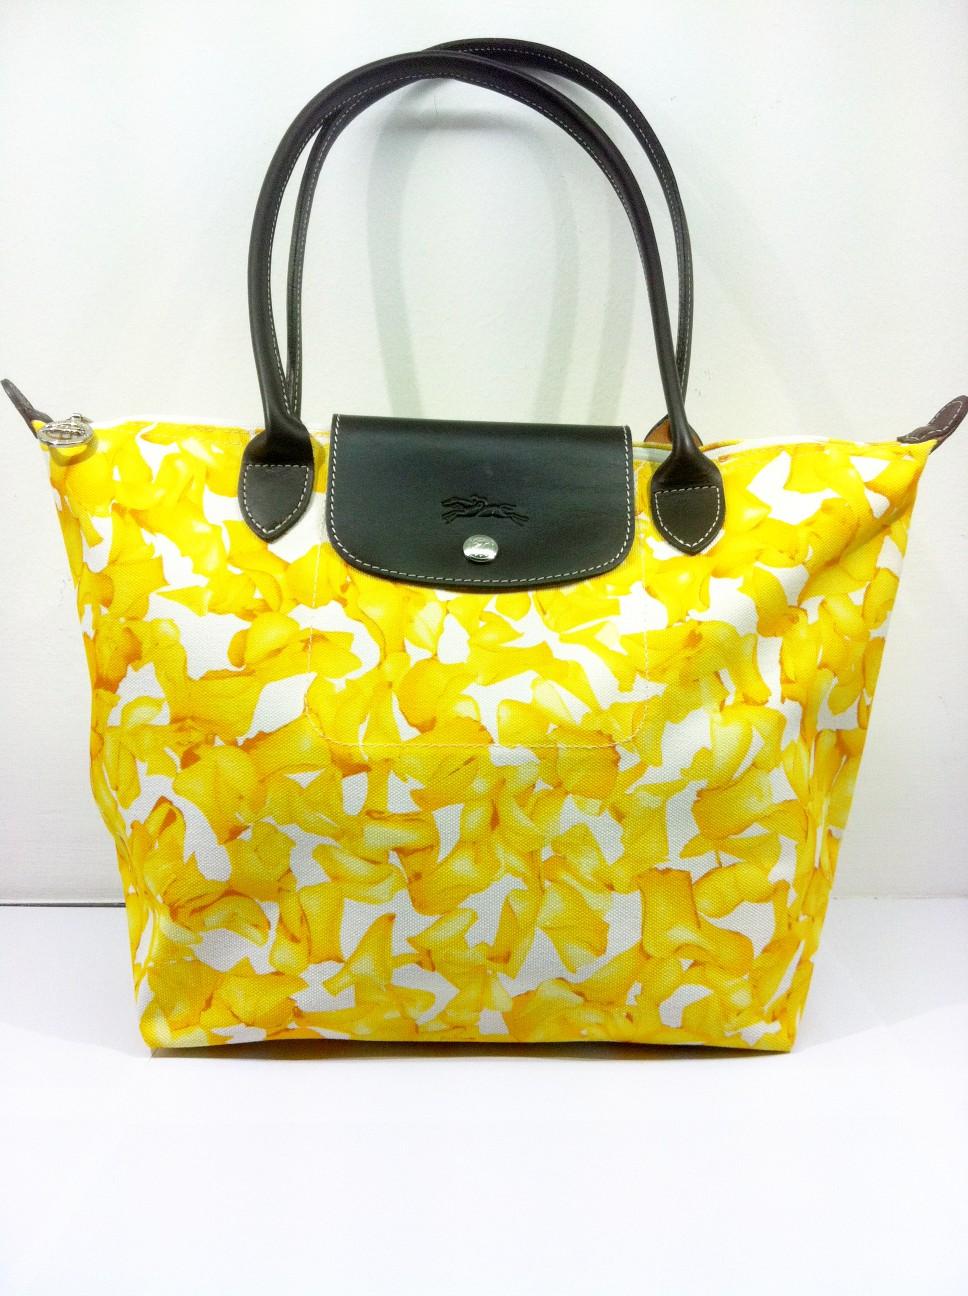 45765ac795a Original LONGCHAMP Floral Print Size Medium + Long Handle Thick canvas  material, Leather handles. RM350.00. NOW RM325.00. LAST PIECE!